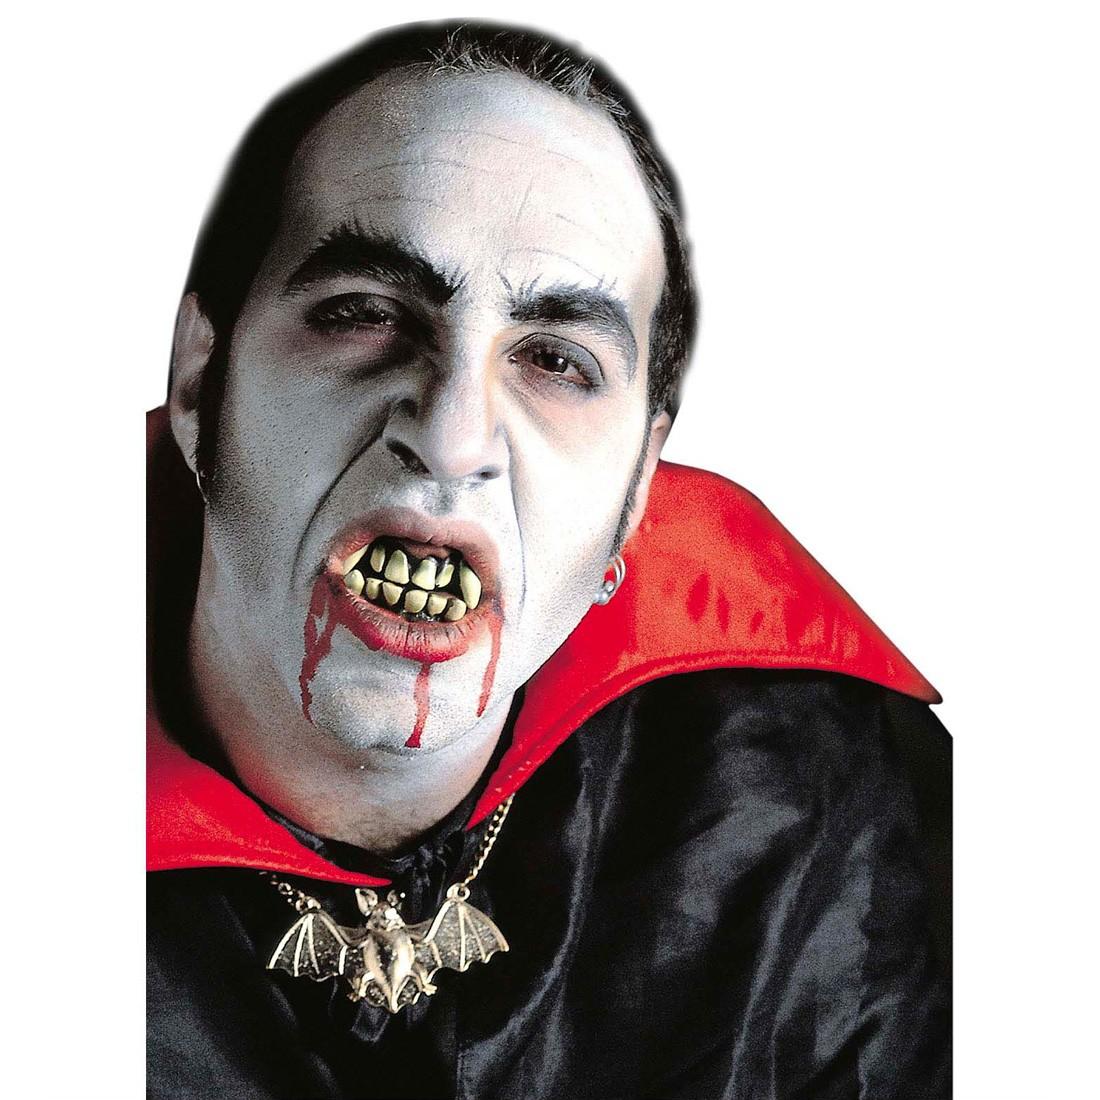 halloween vampirz hne vampir gebiss z hne 3 95. Black Bedroom Furniture Sets. Home Design Ideas